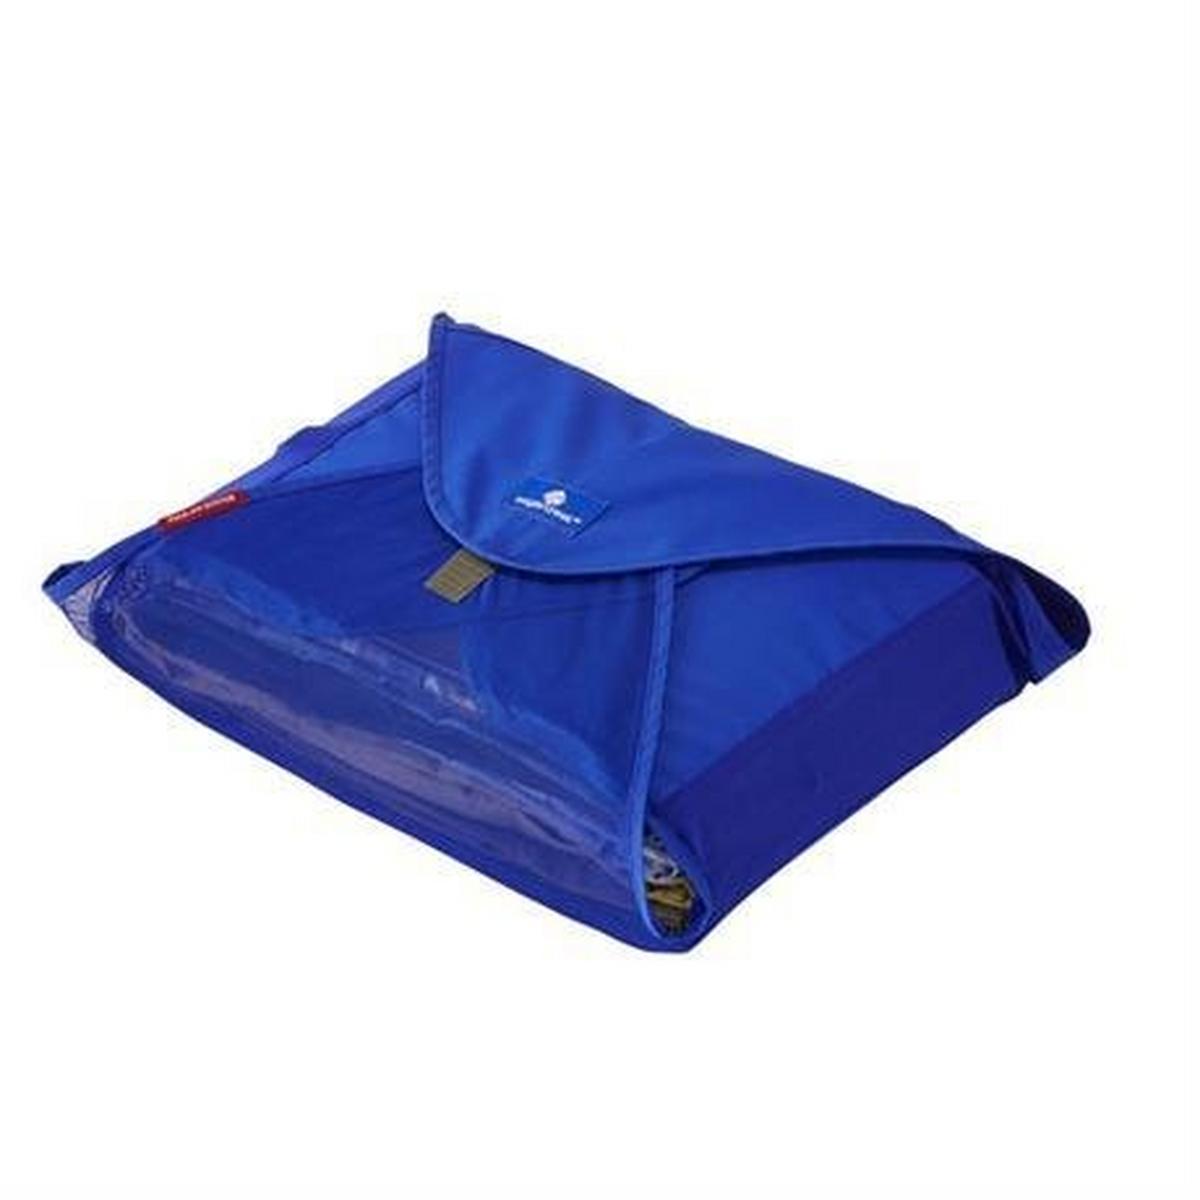 Eagle Creek Travel Luggage: Pack-It Original Garment Folder MEDIUM Blue Sea